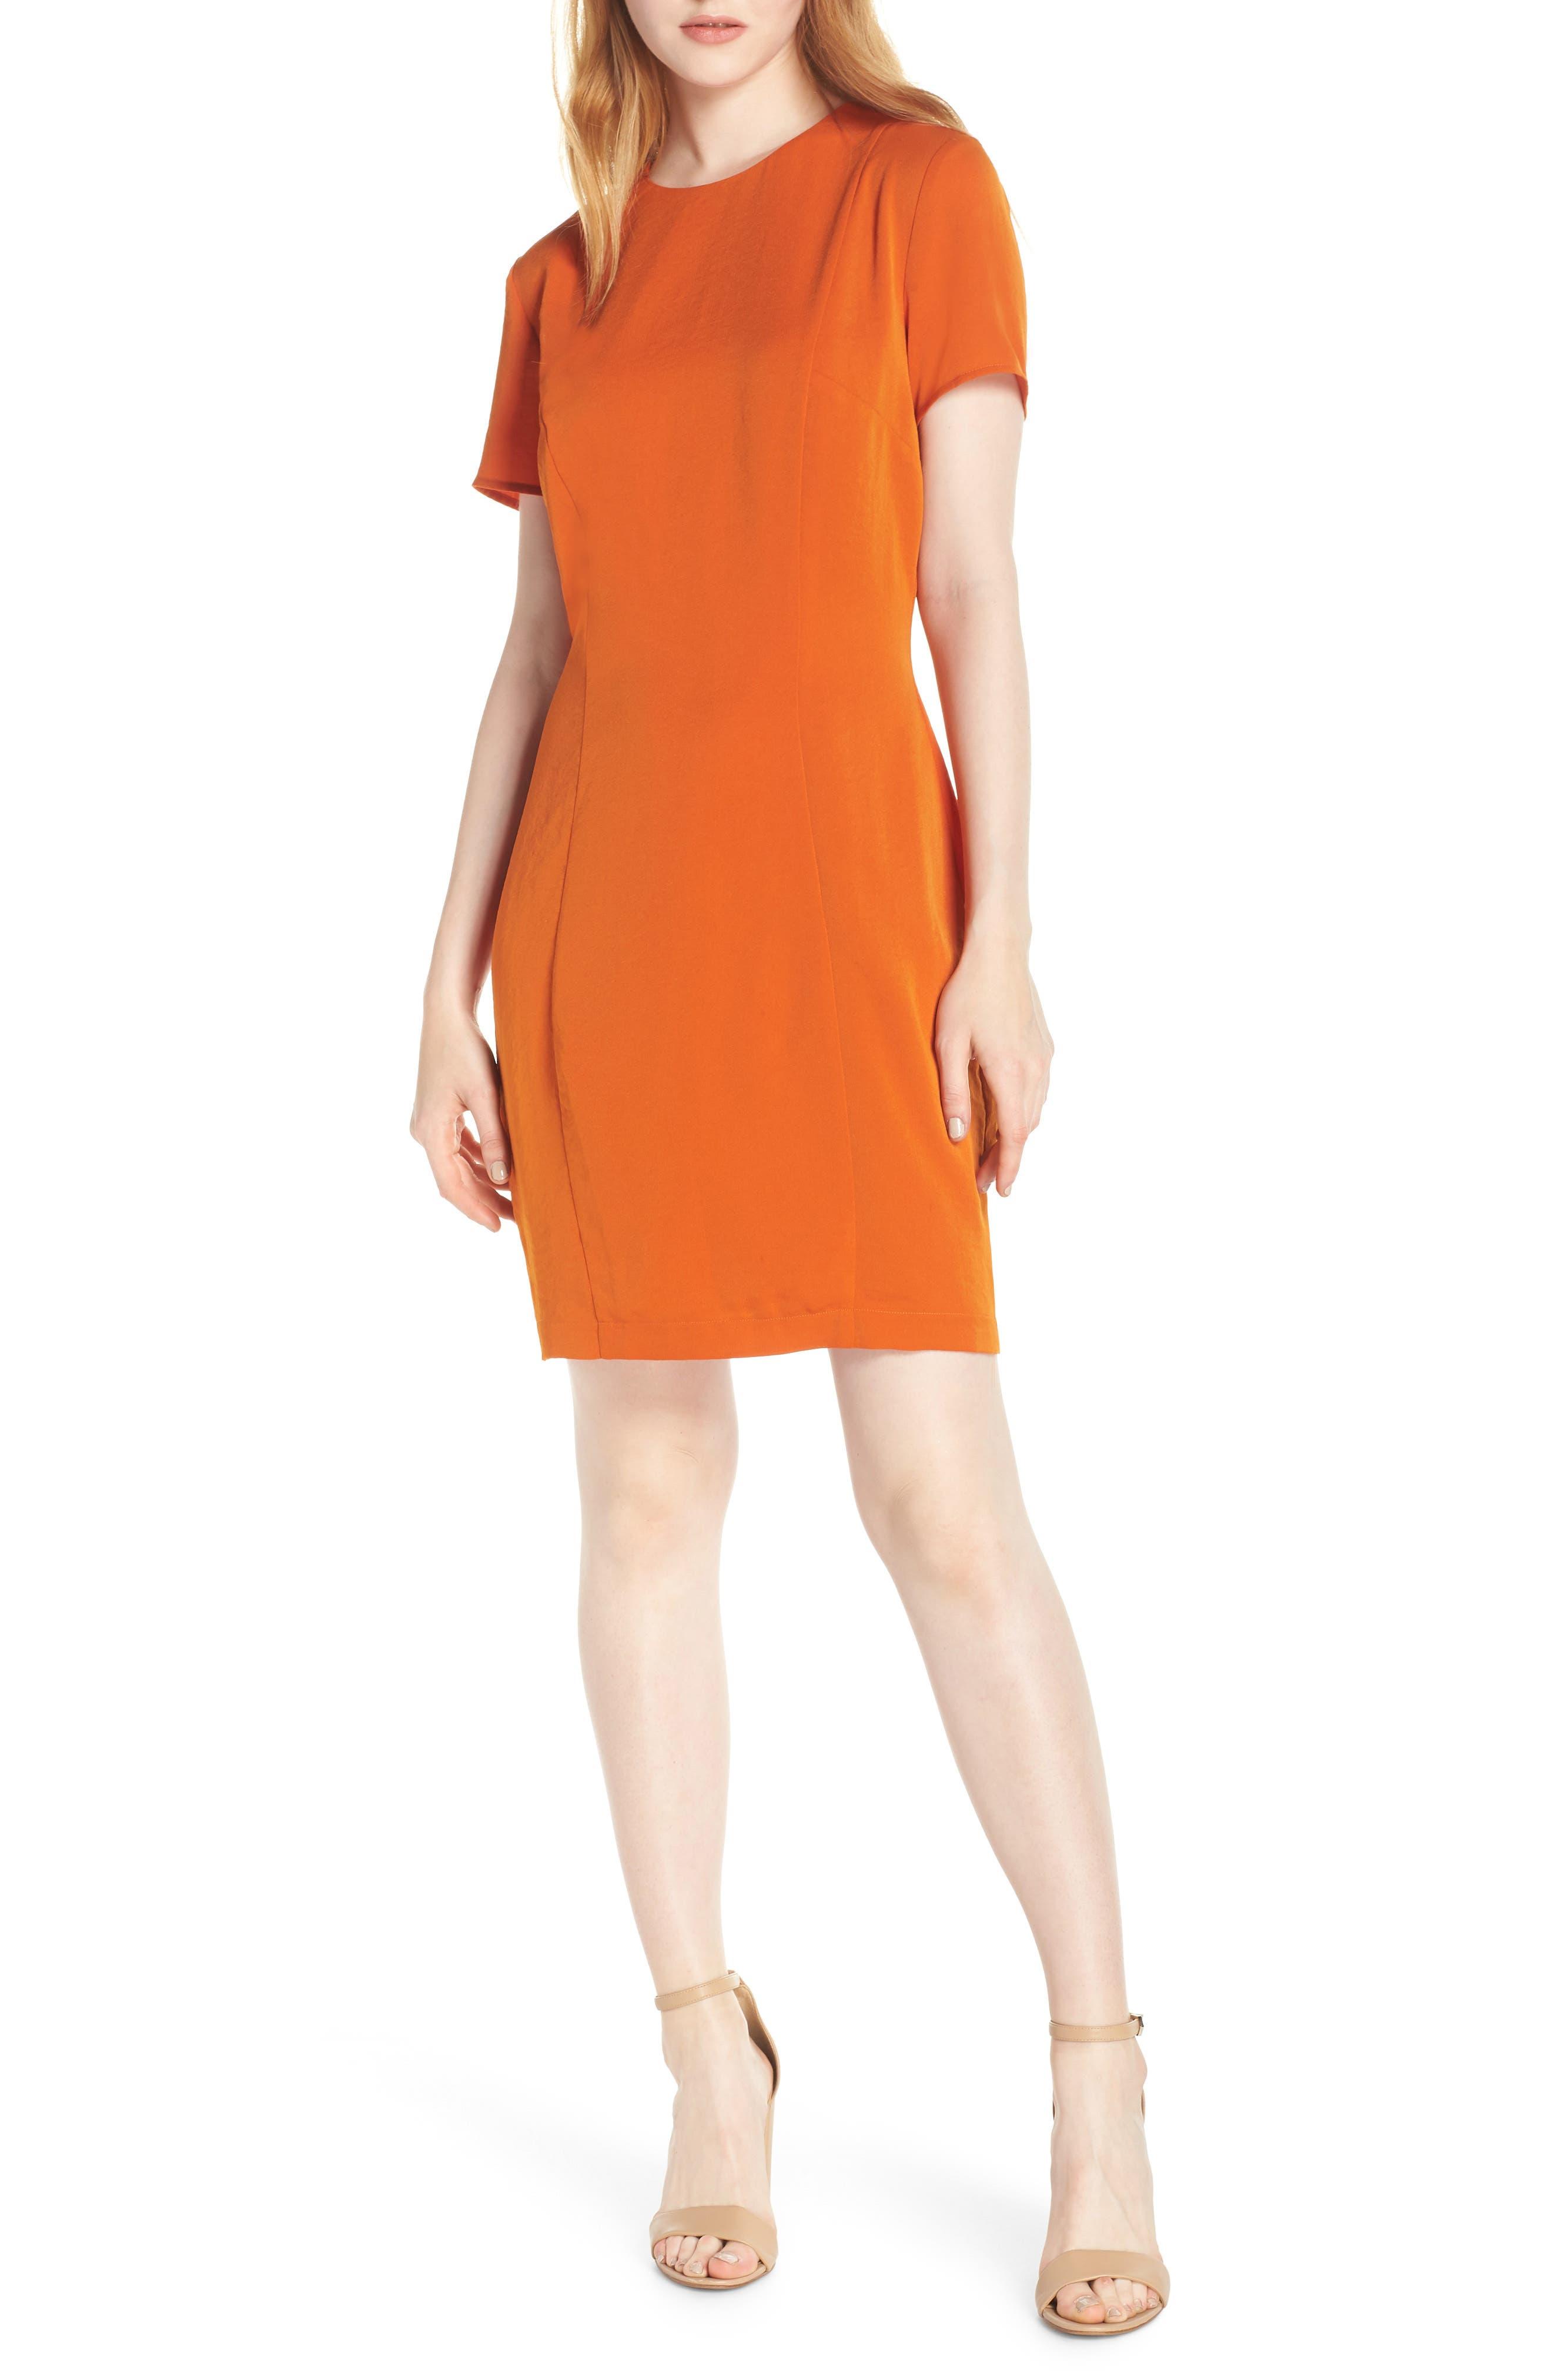 Nsr Sofia Short Sleeve Sheath Dress